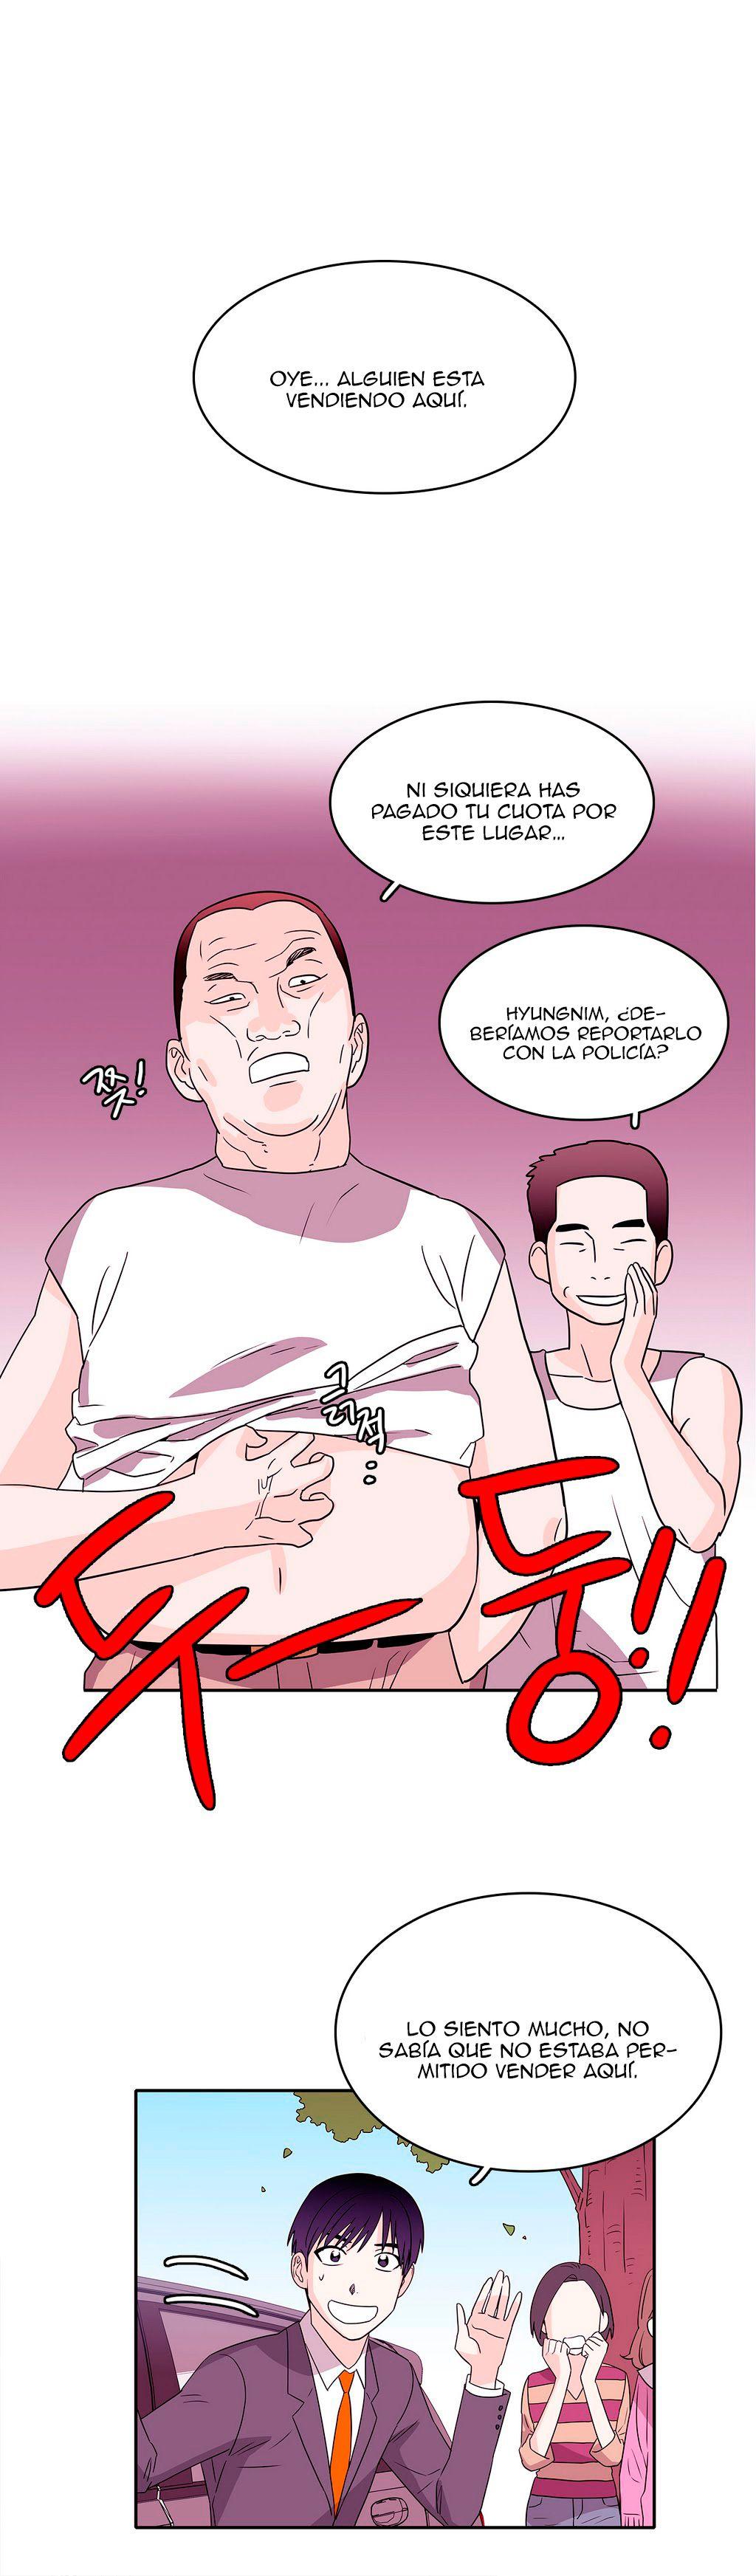 http://c5.ninemanga.com/es_manga/51/19443/463659/95ba923bbc8a0d714bbe6cba093c1e41.jpg Page 2